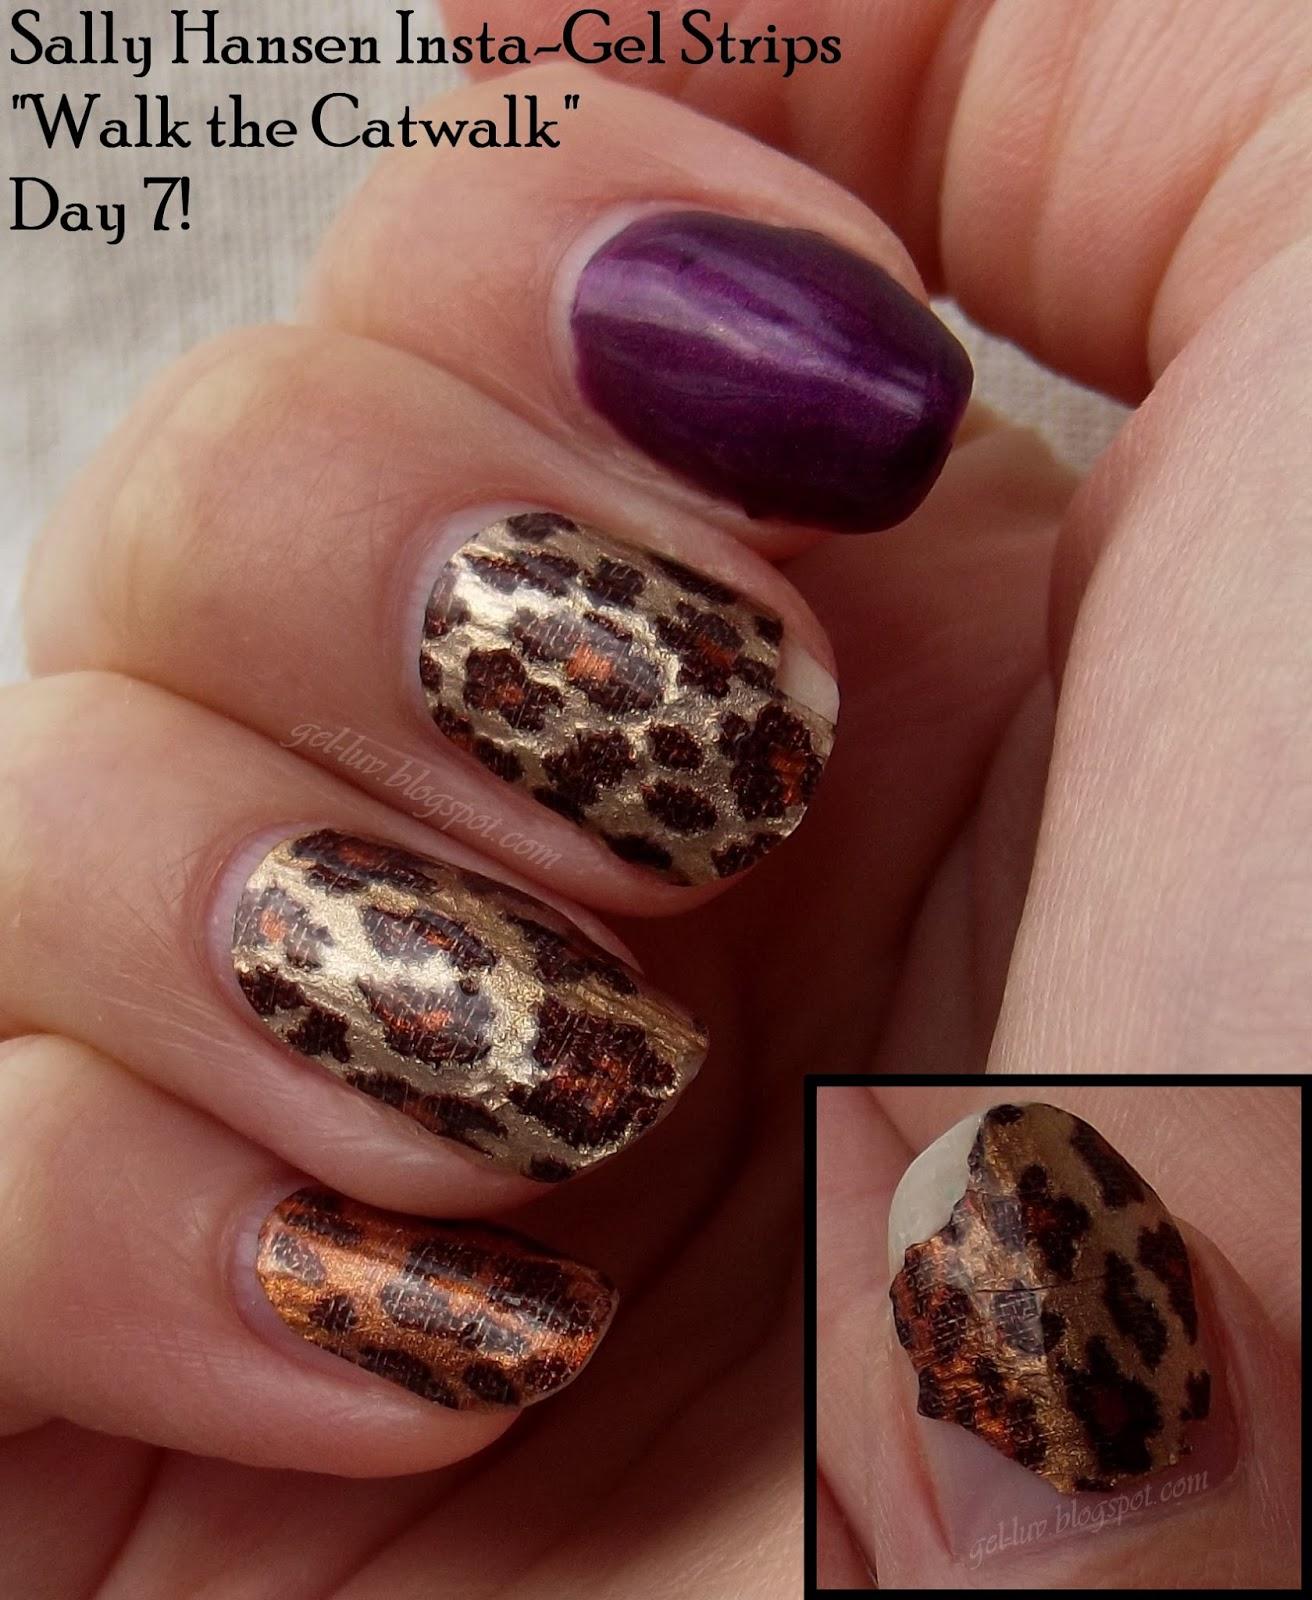 Opi Nail Polish Strips Review – Papillon Day Spa